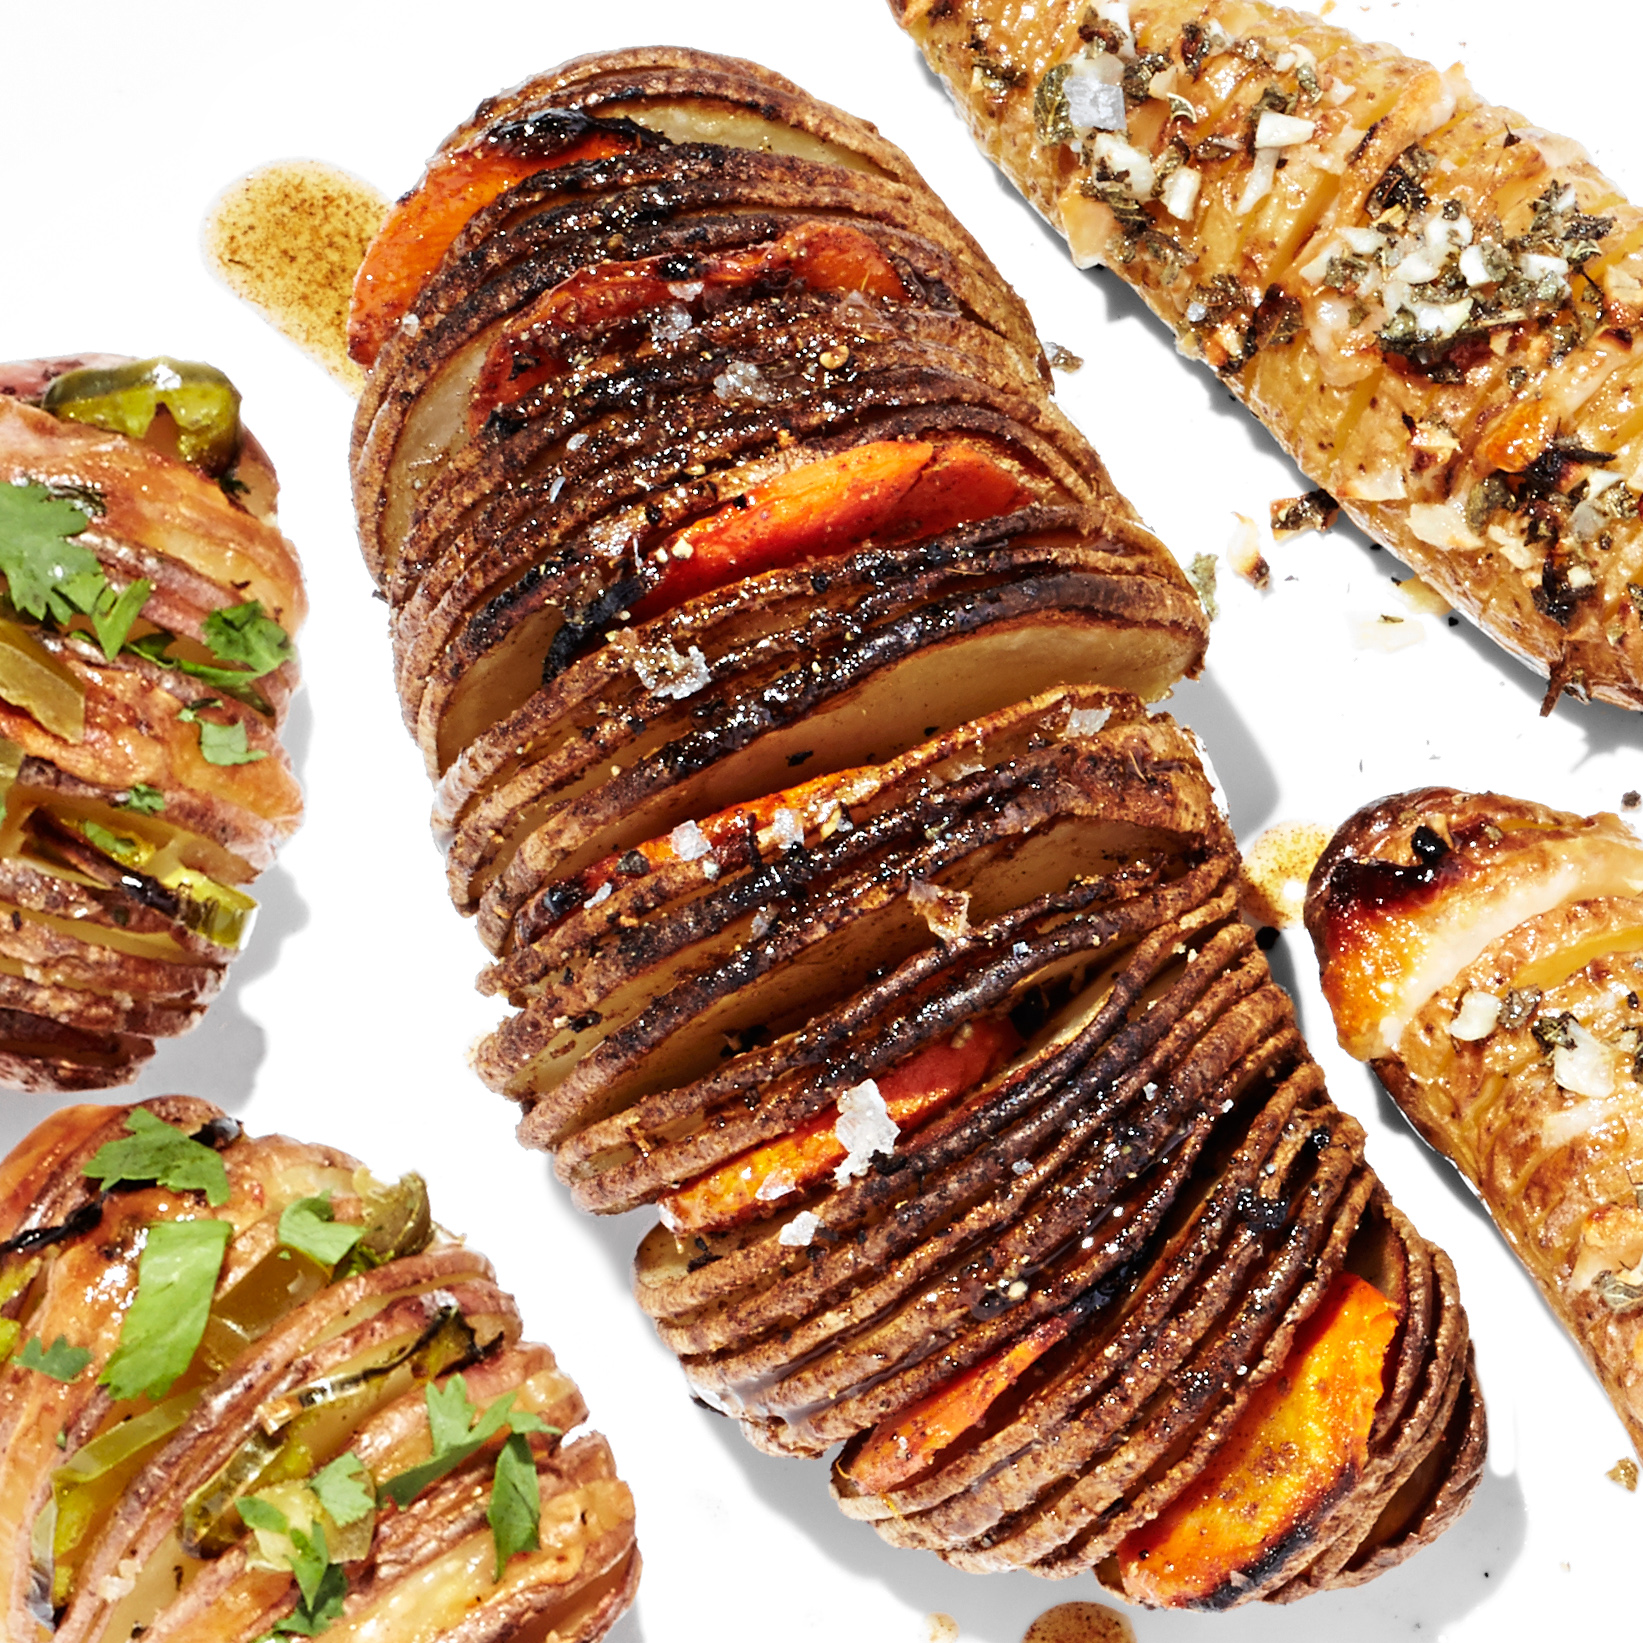 carrot top hasselback potatoes